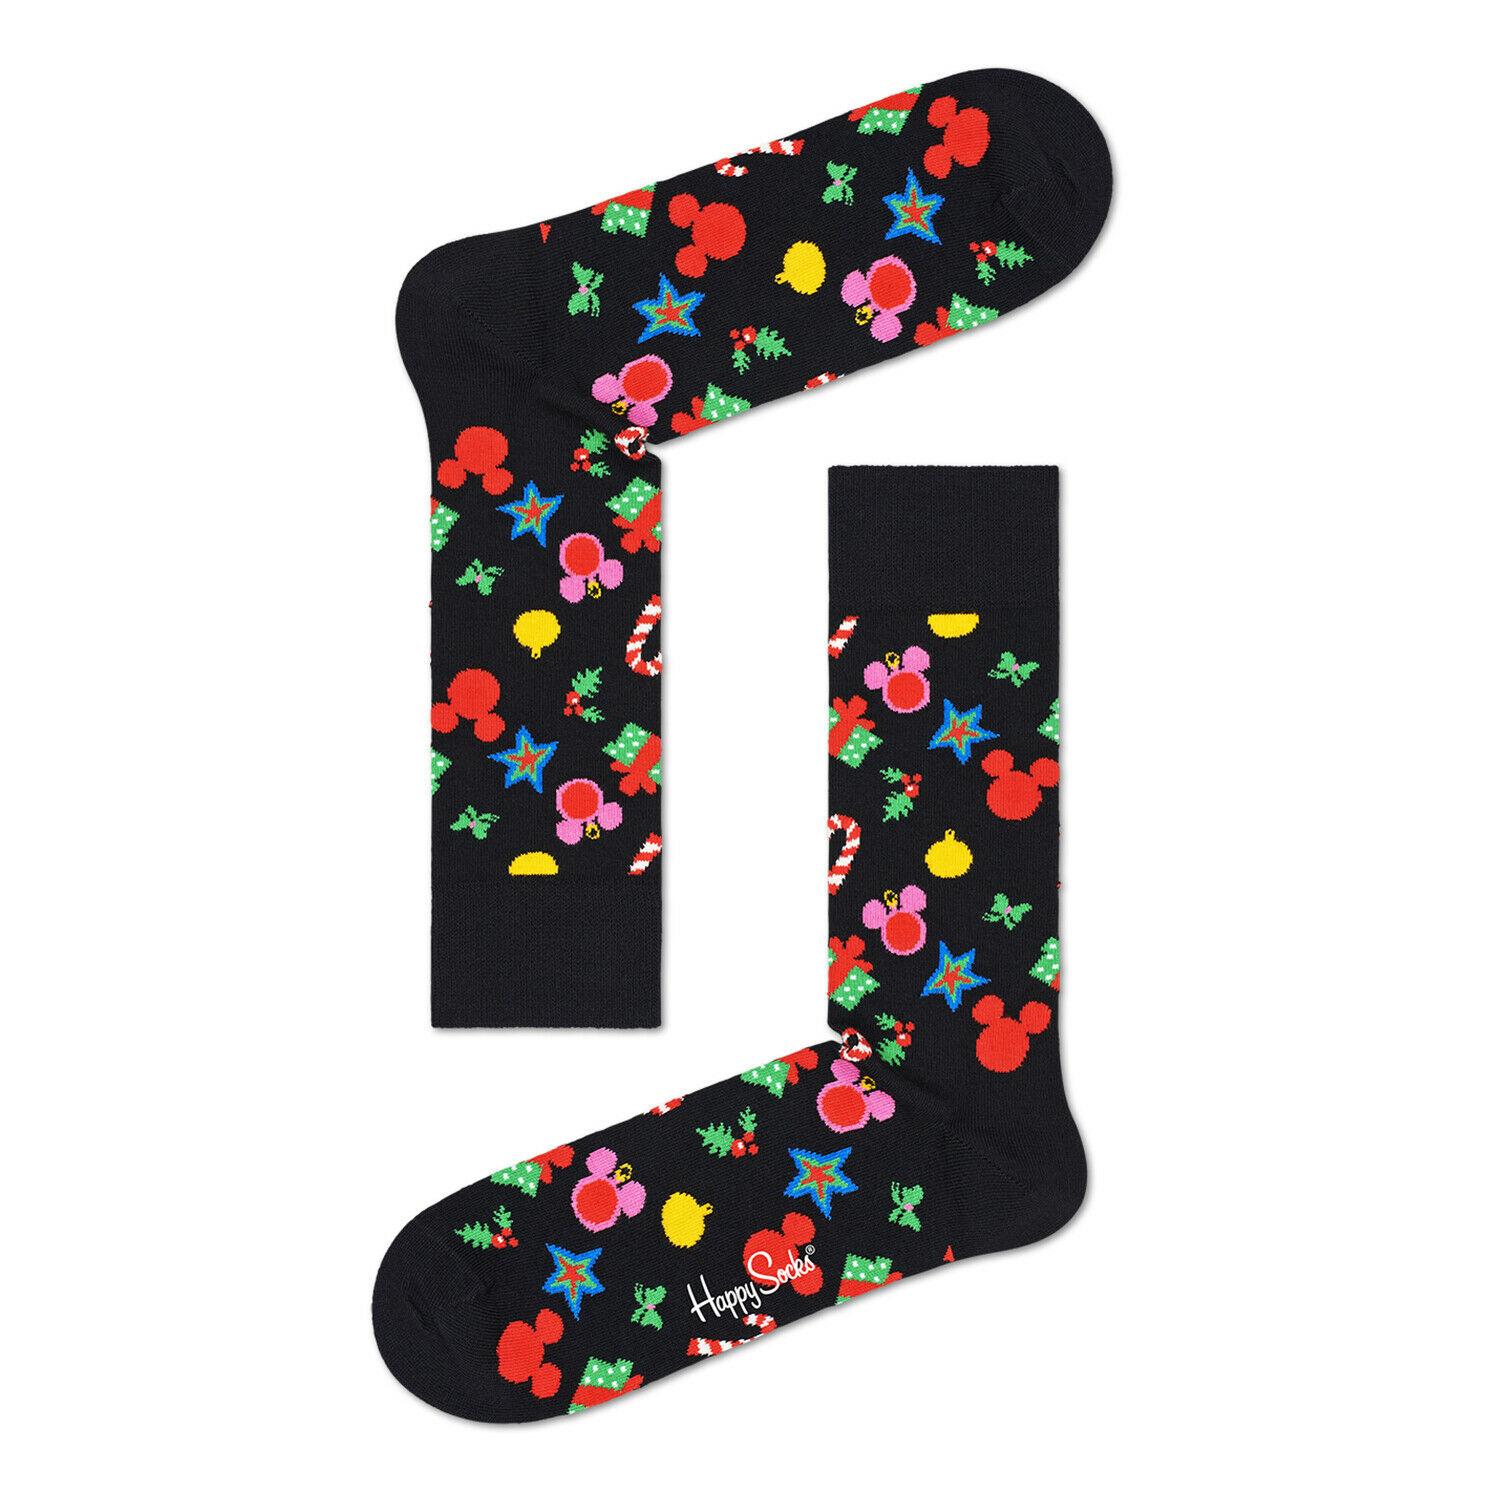 Happy Socks – Set of 4 Pairs of Disney Holiday Socks in Presentation Gift Box